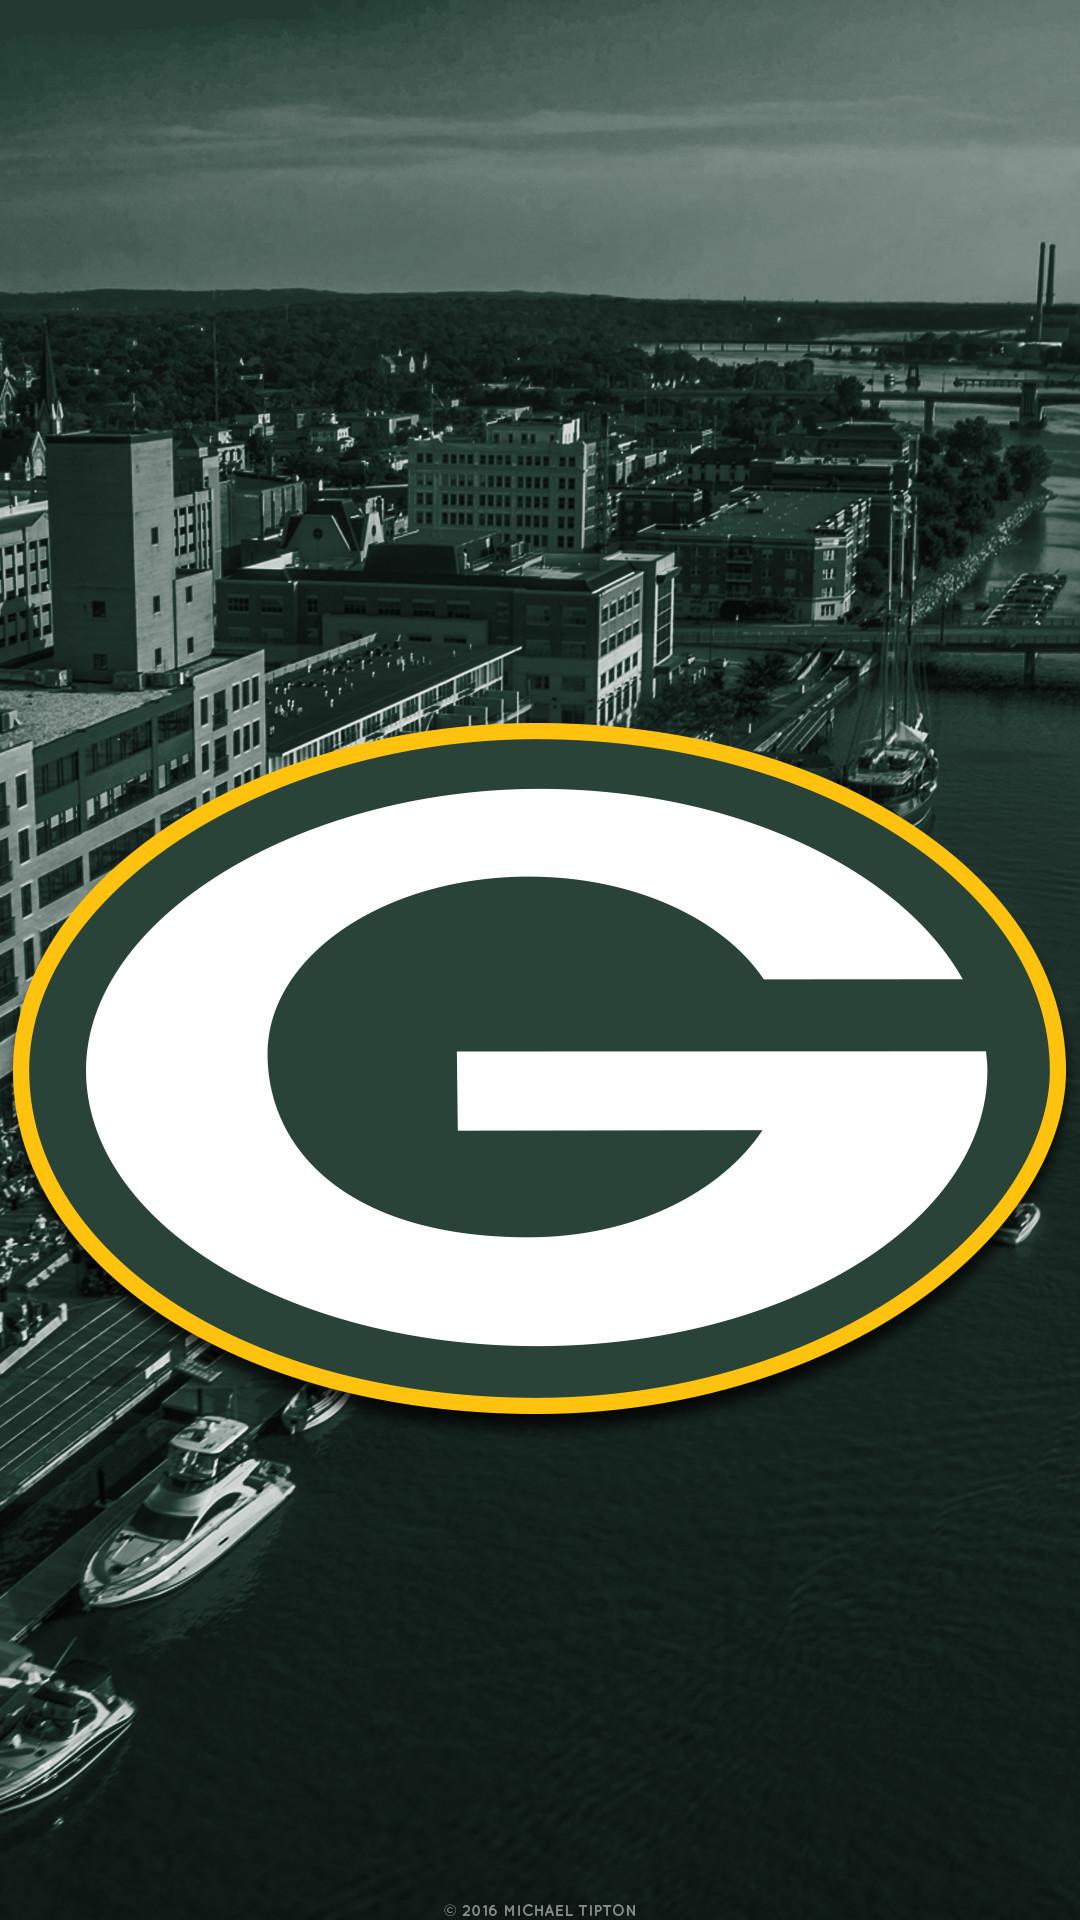 … Green Bay Packers city 2017 logo wallpaper free iphone 5, 6, 7, galaxy